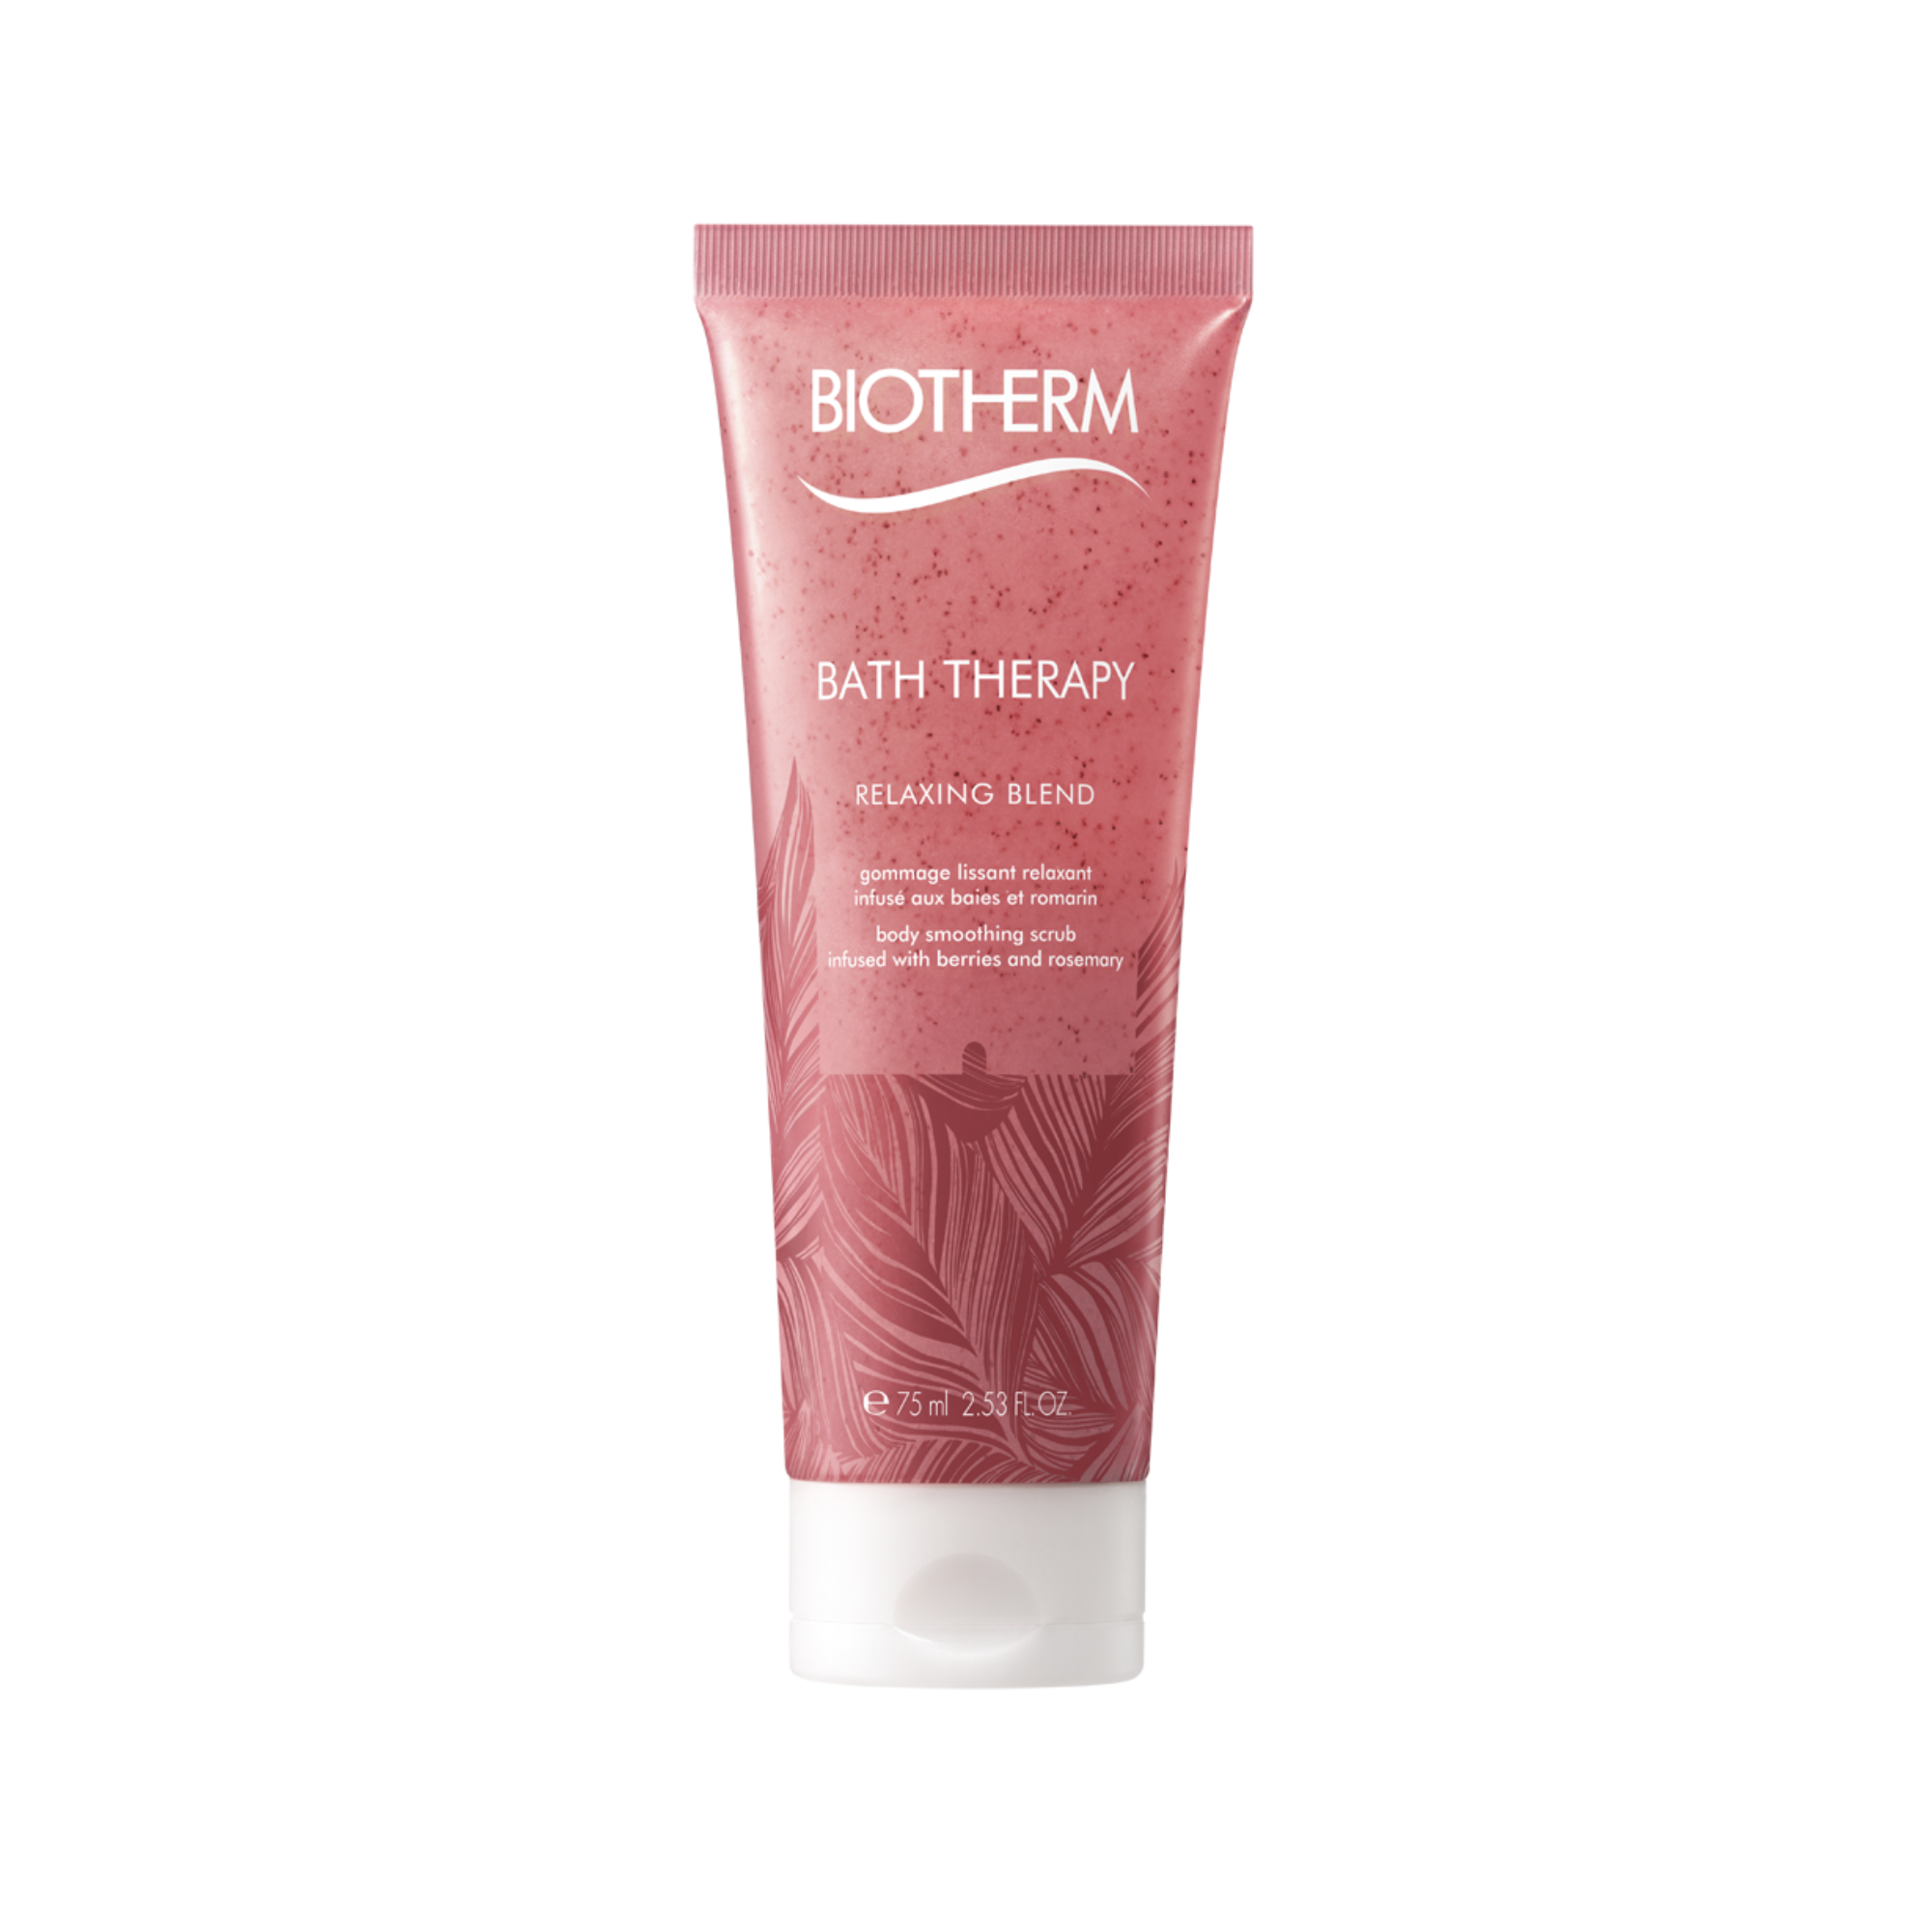 Bath Therapy Relaxing Blend Body Scrub Travel Size 75ml